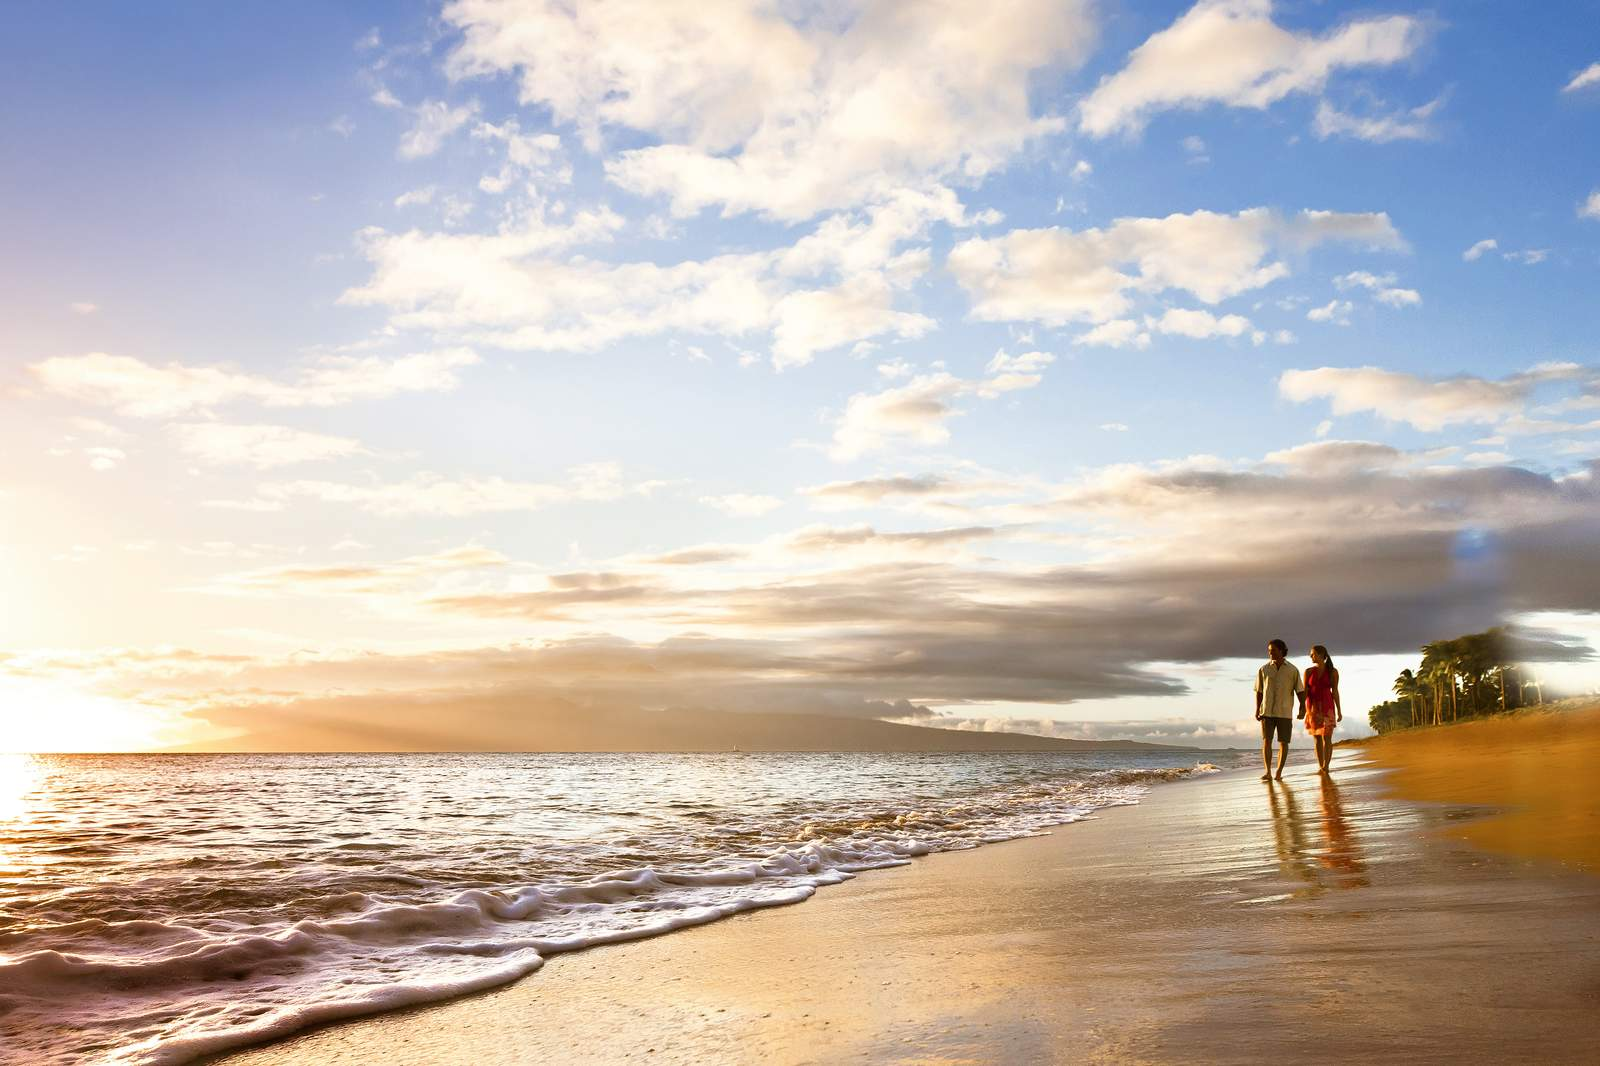 Strandfeeling auf Maui